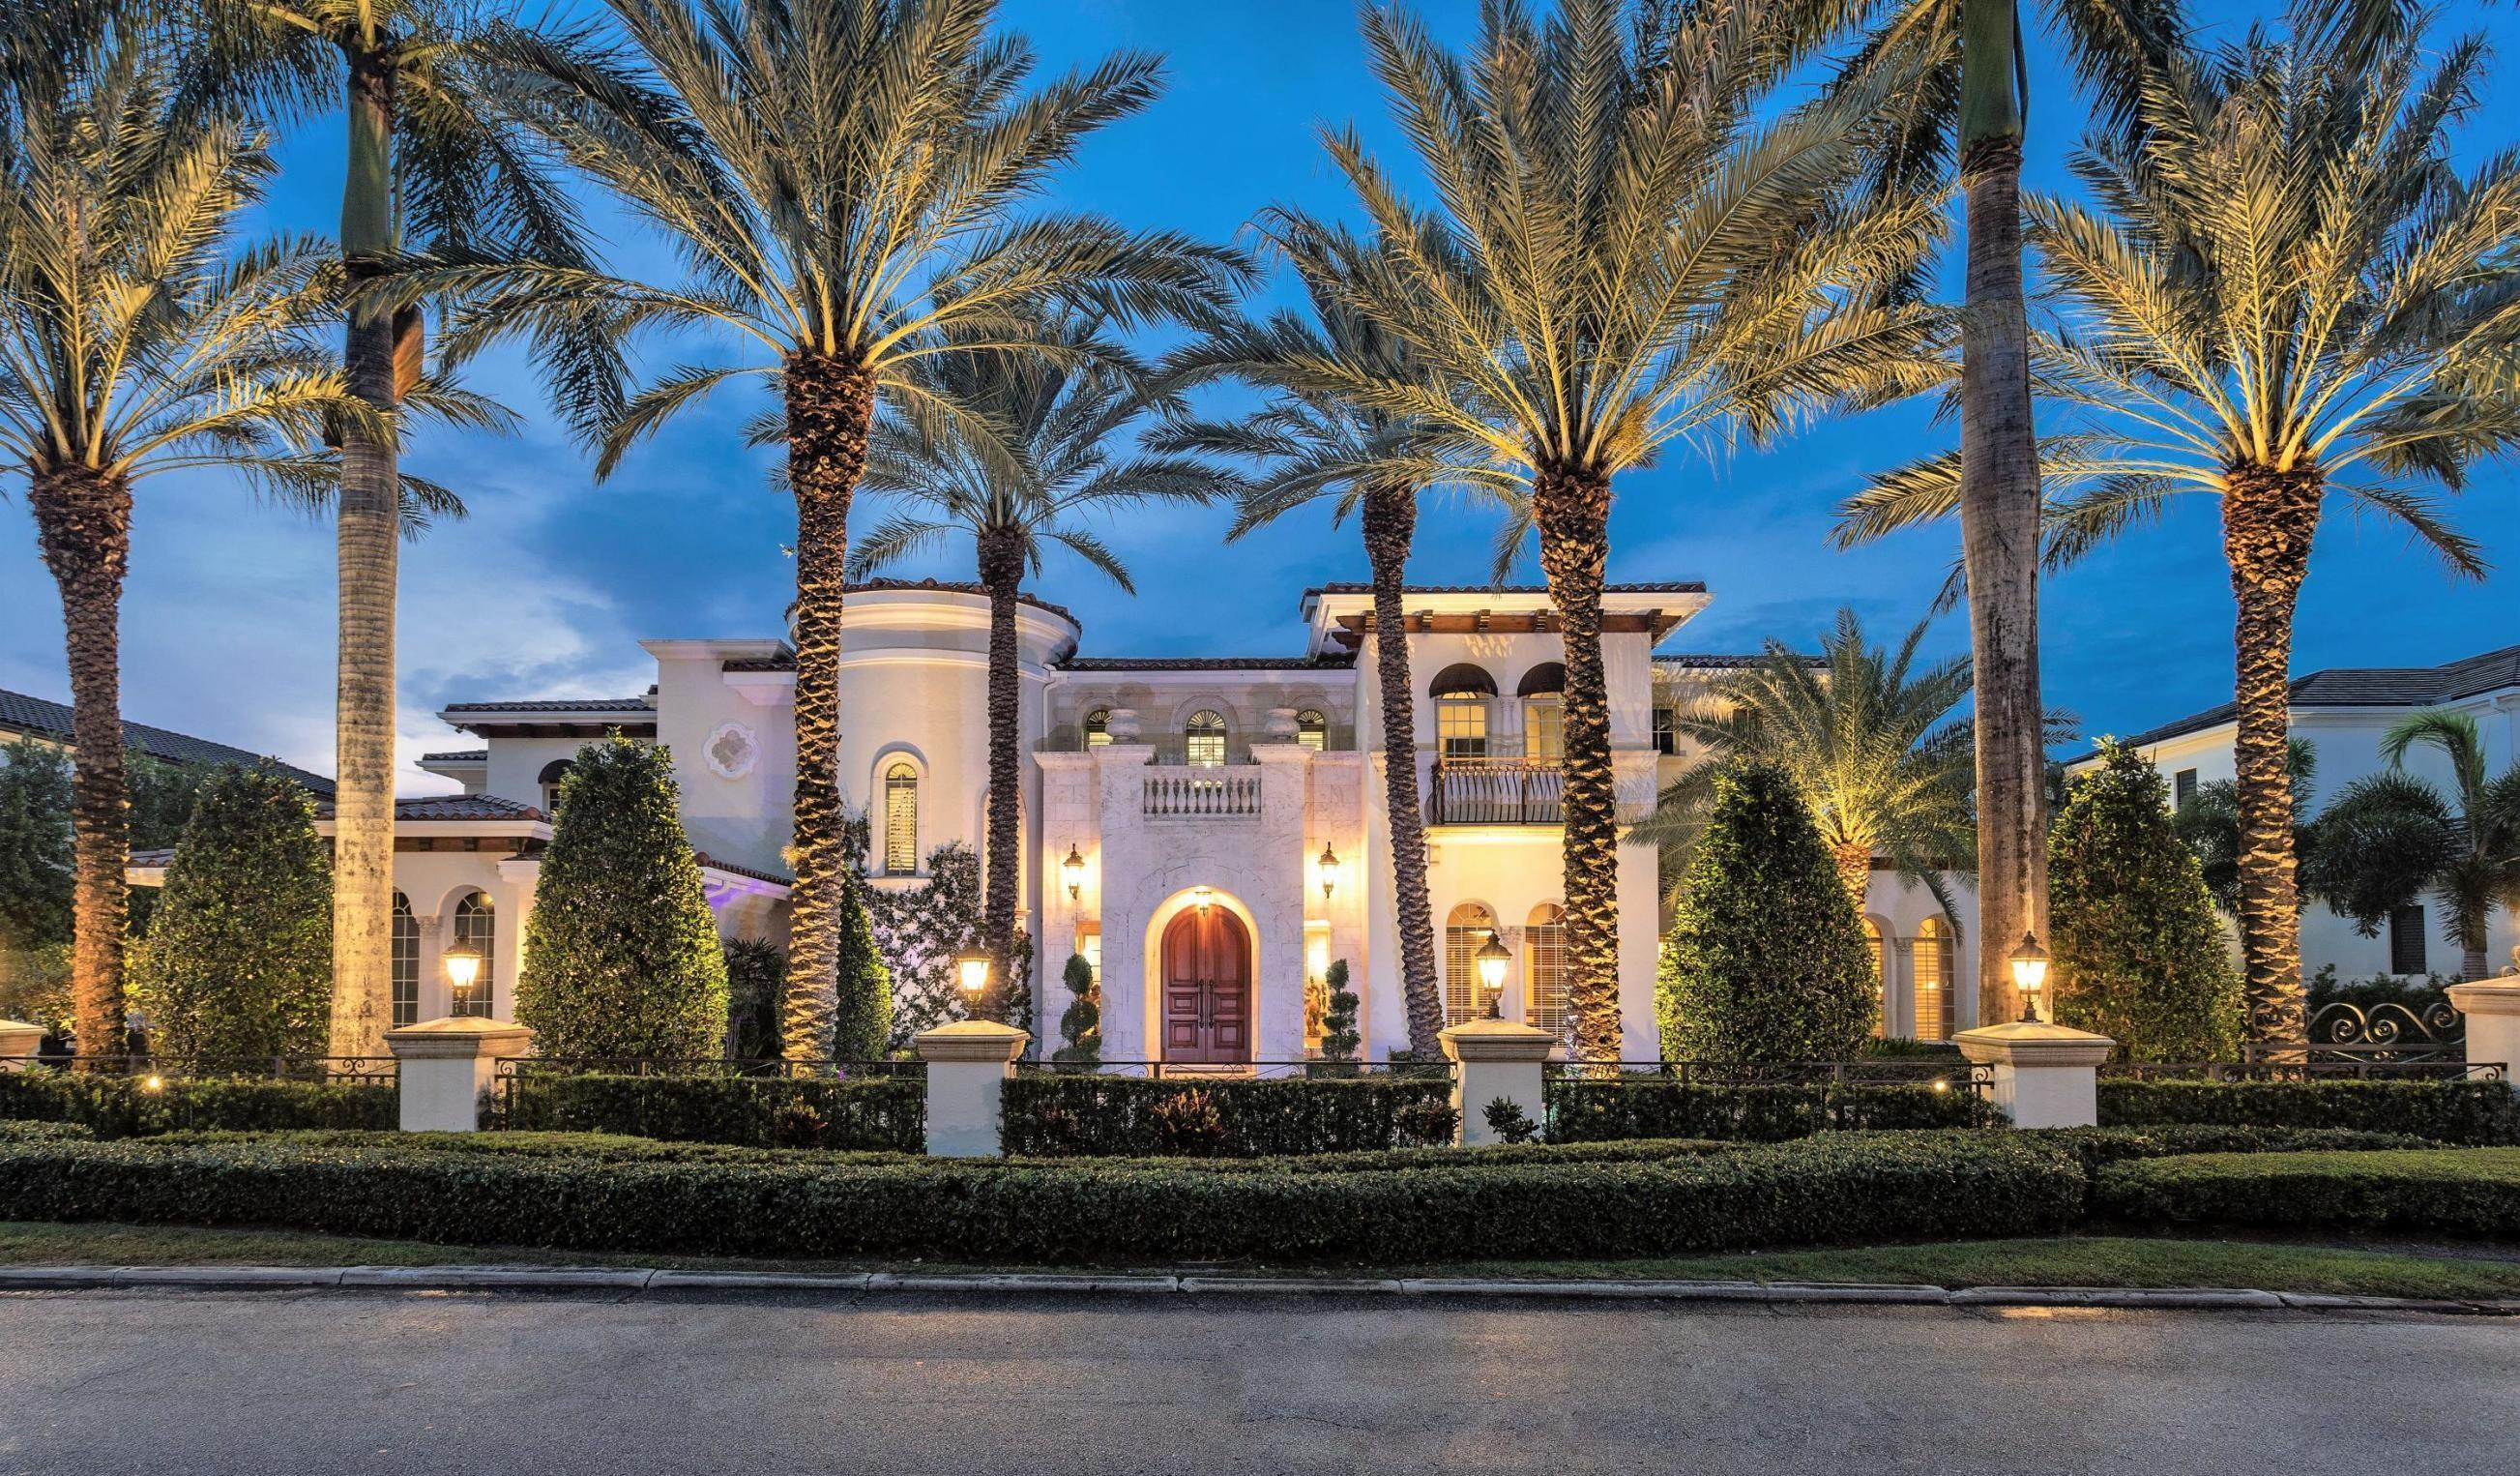 251 W Coconut Palm Road, Boca Raton, Florida 33432, 7 Bedrooms Bedrooms, ,9.2 BathroomsBathrooms,Single family detached,For sale,Coconut Palm,RX-10627390